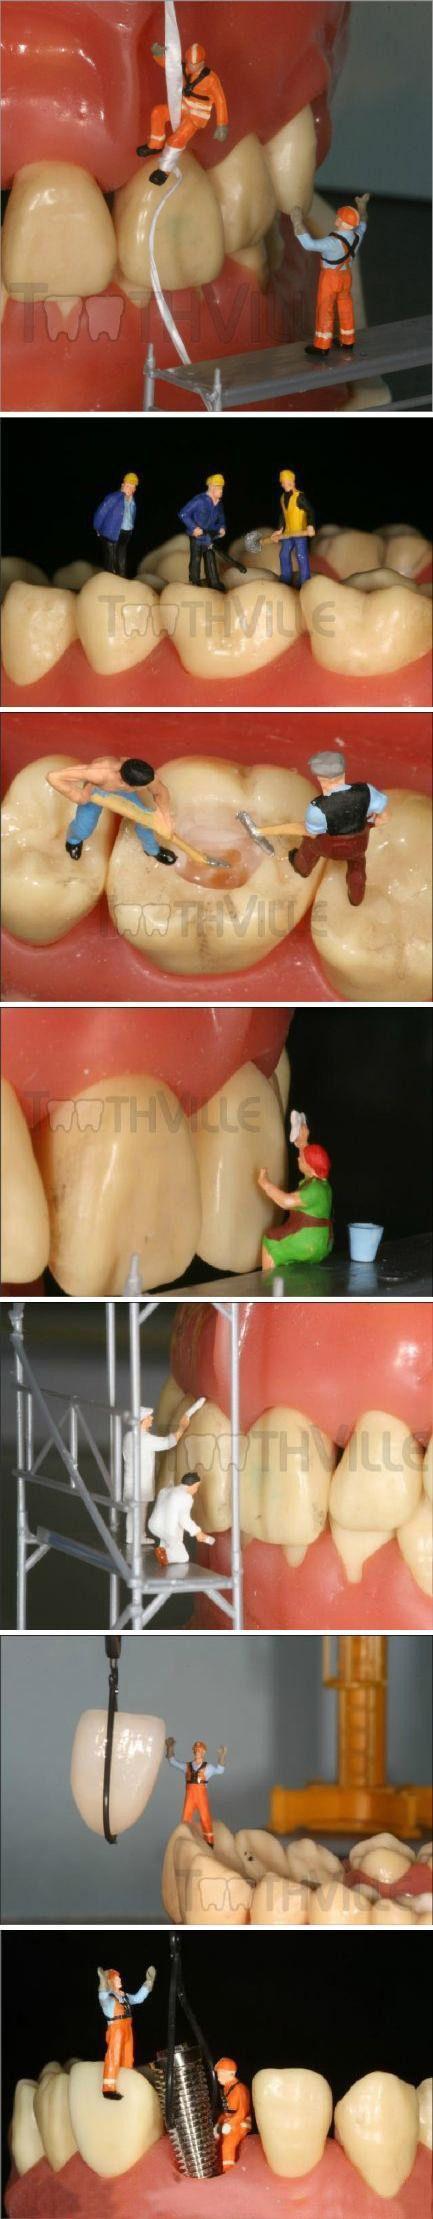 Toothville